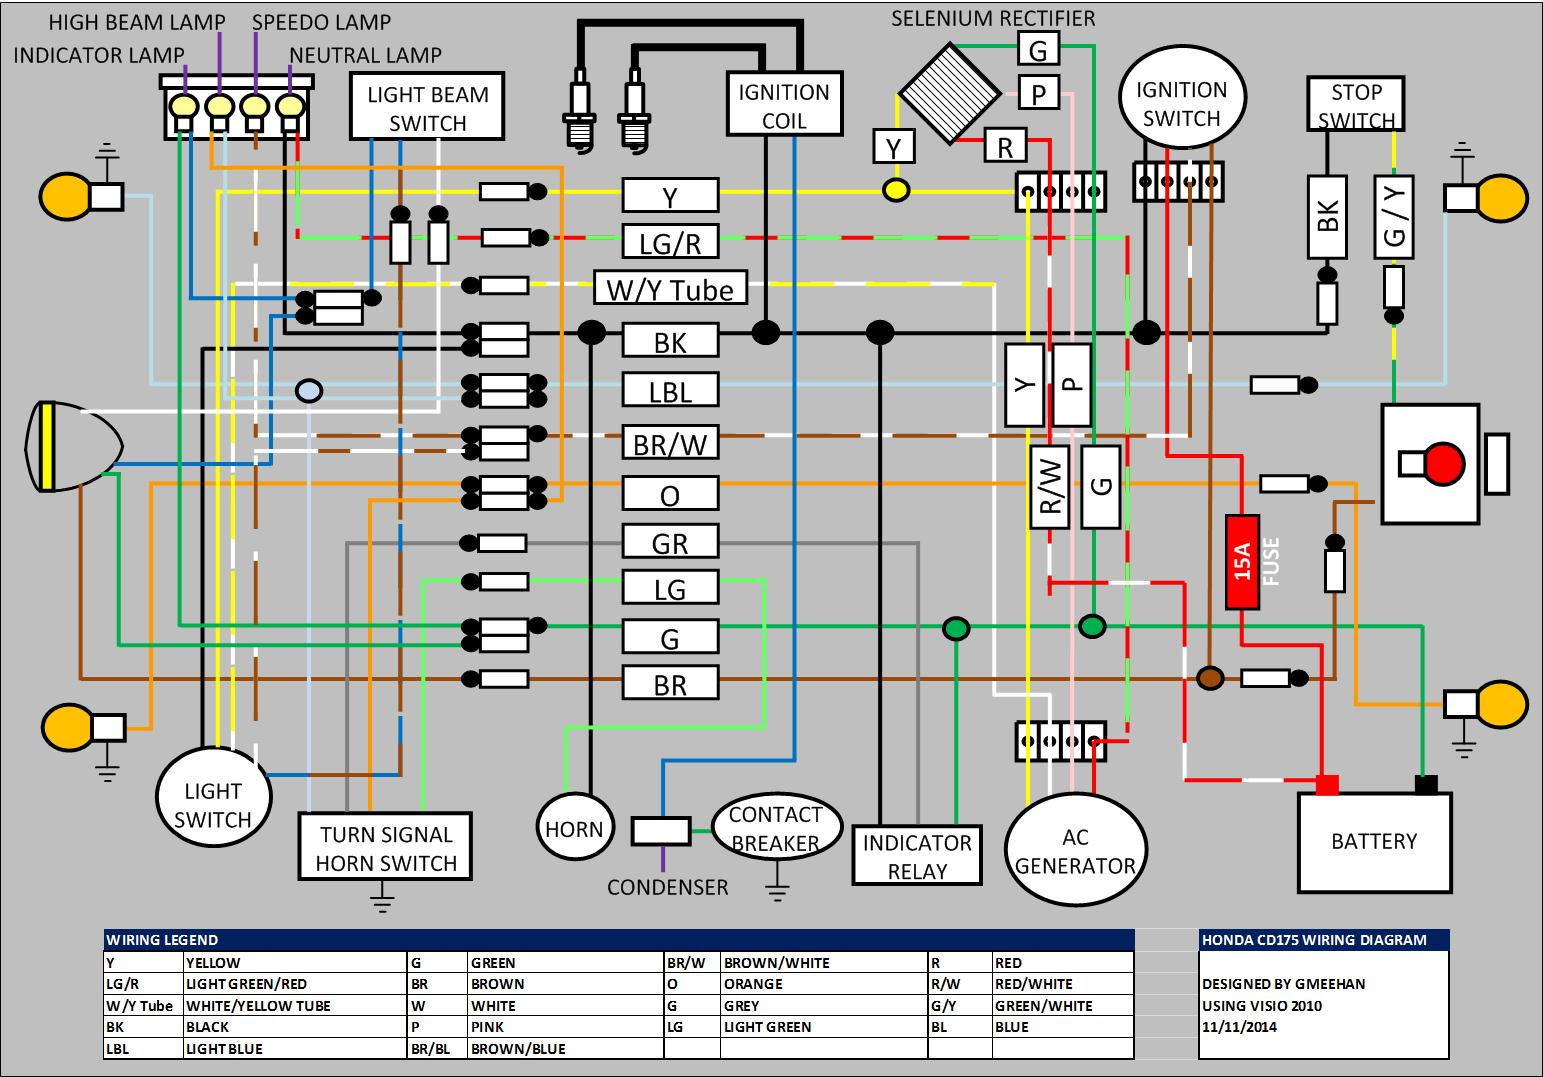 DIAGRAM] Suzuki Access 125 User Wiring Diagram FULL Version HD Quality Wiring  Diagram - ILIKETOREAD.CHAIRE-CTSC.FR